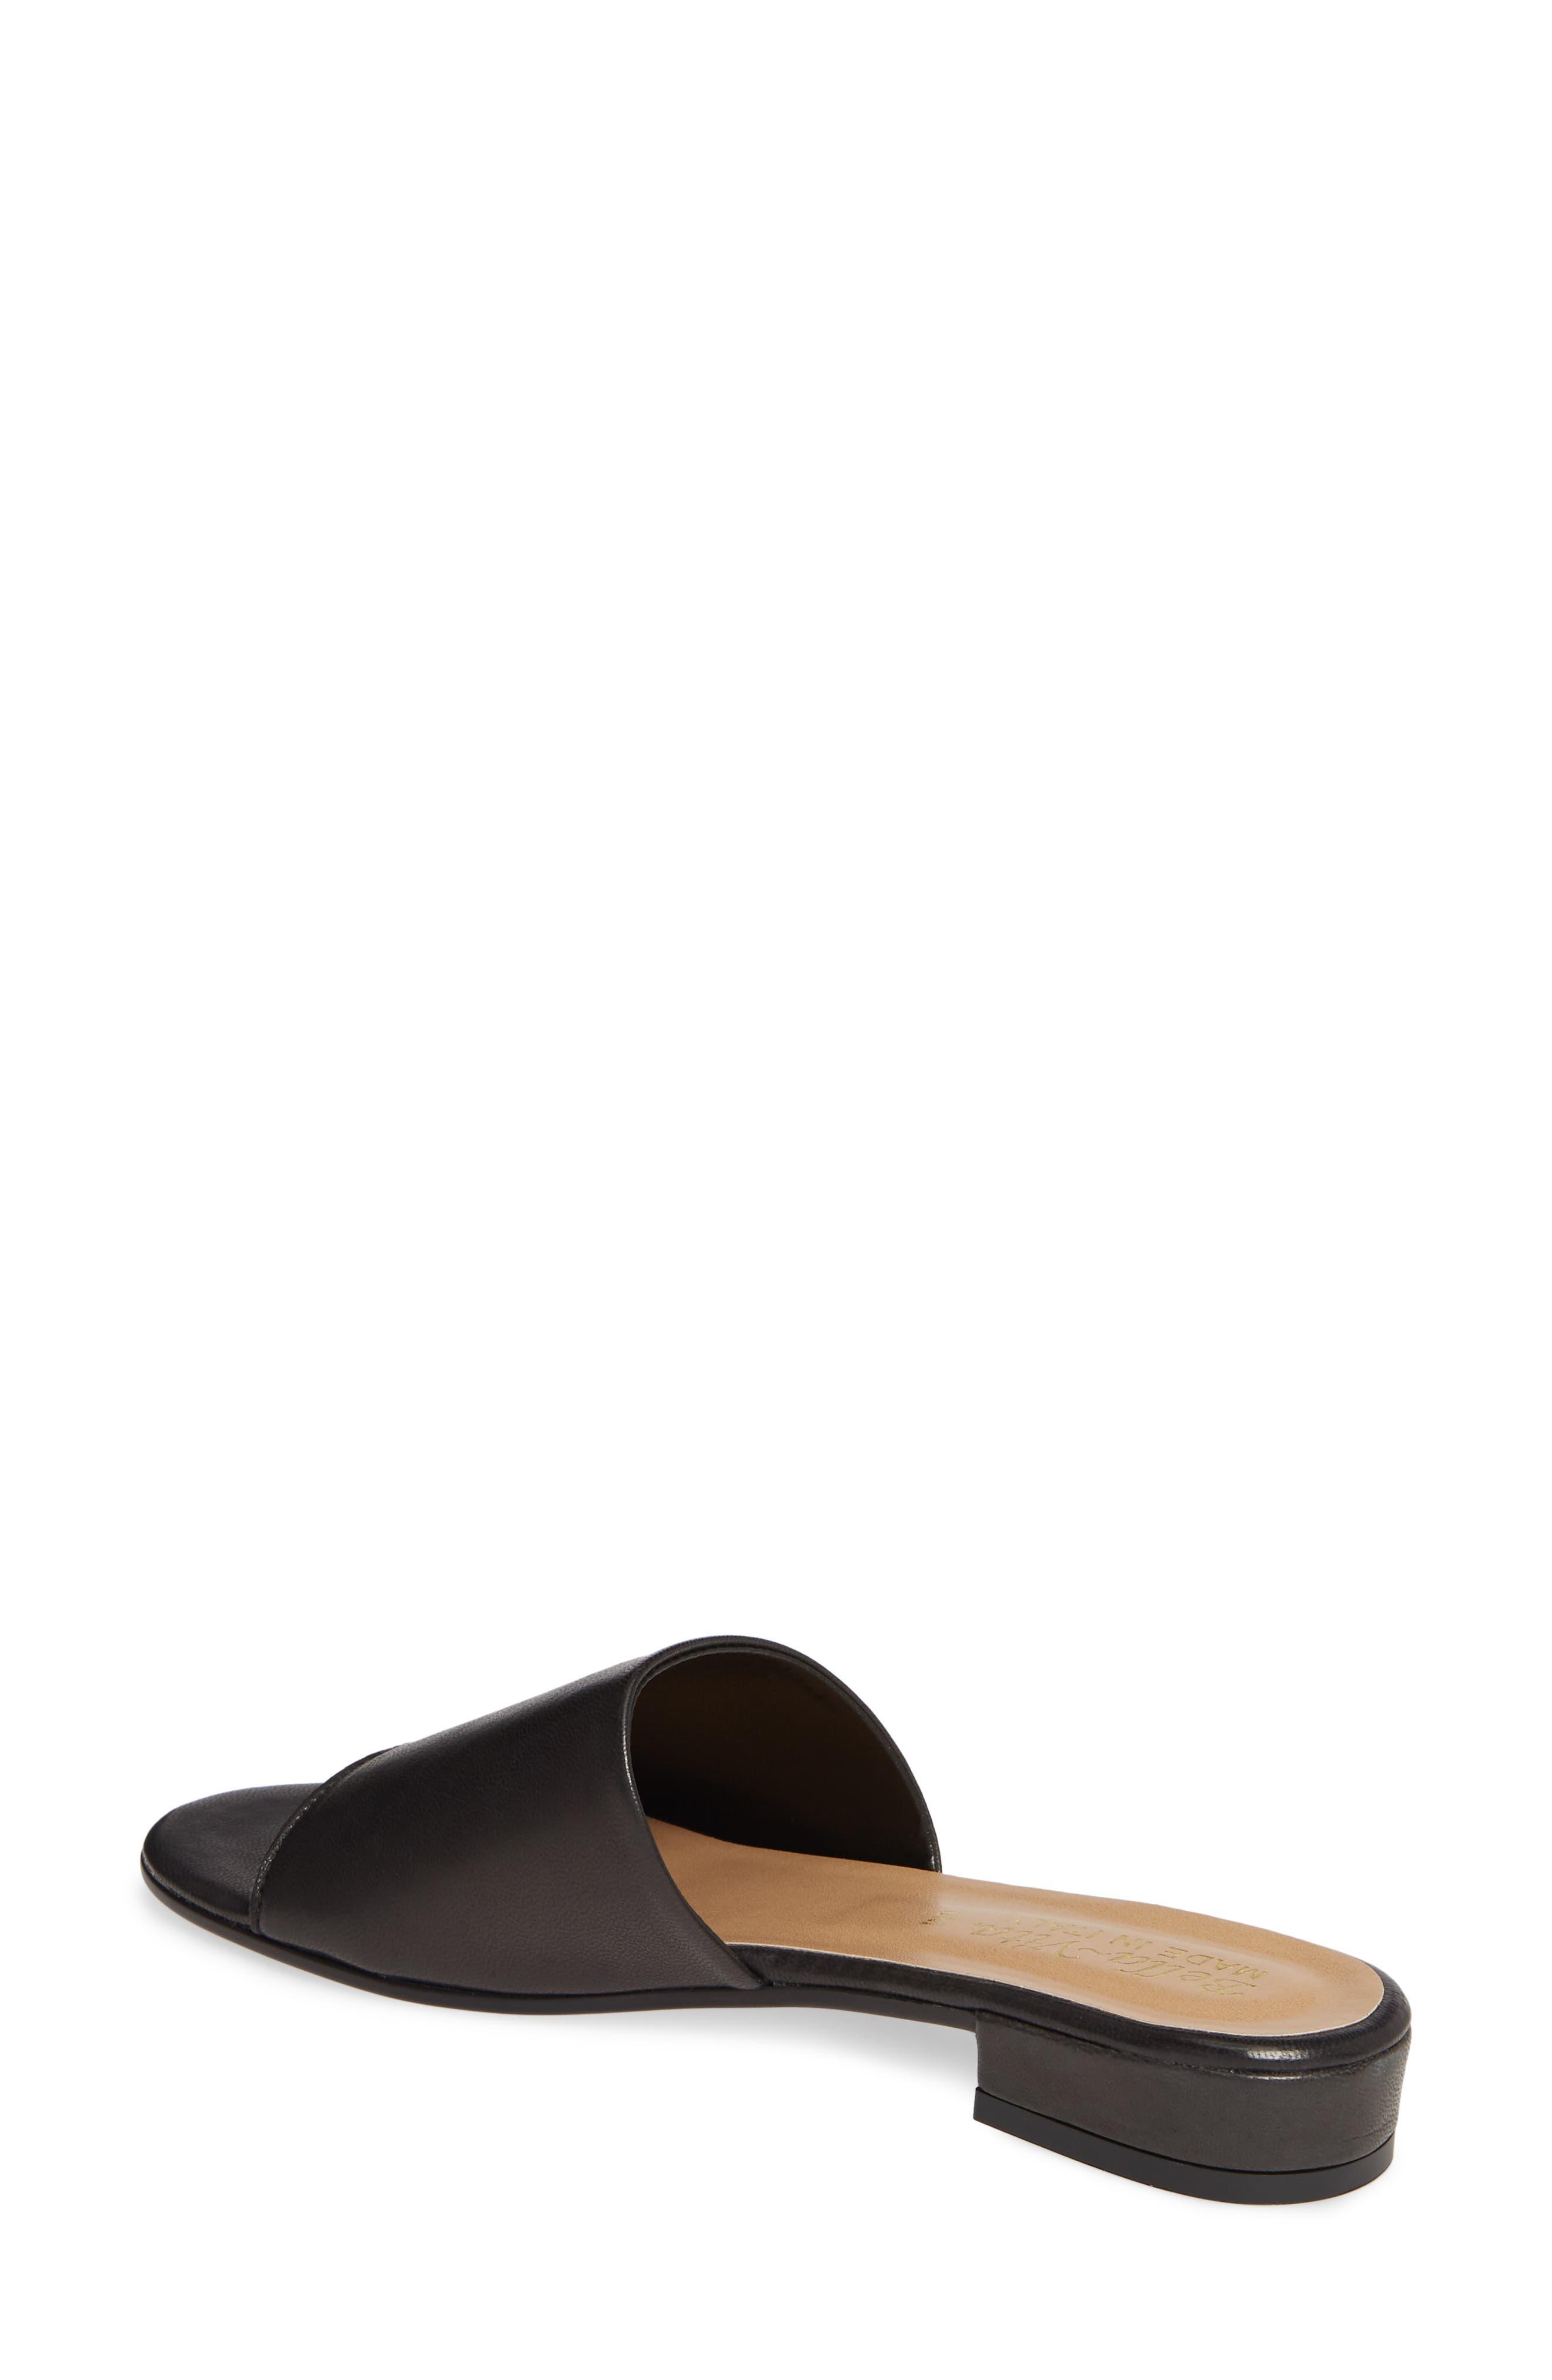 BELLA VITA, Slide Sandal, Alternate thumbnail 2, color, BLACK ITALIAN LEATHER